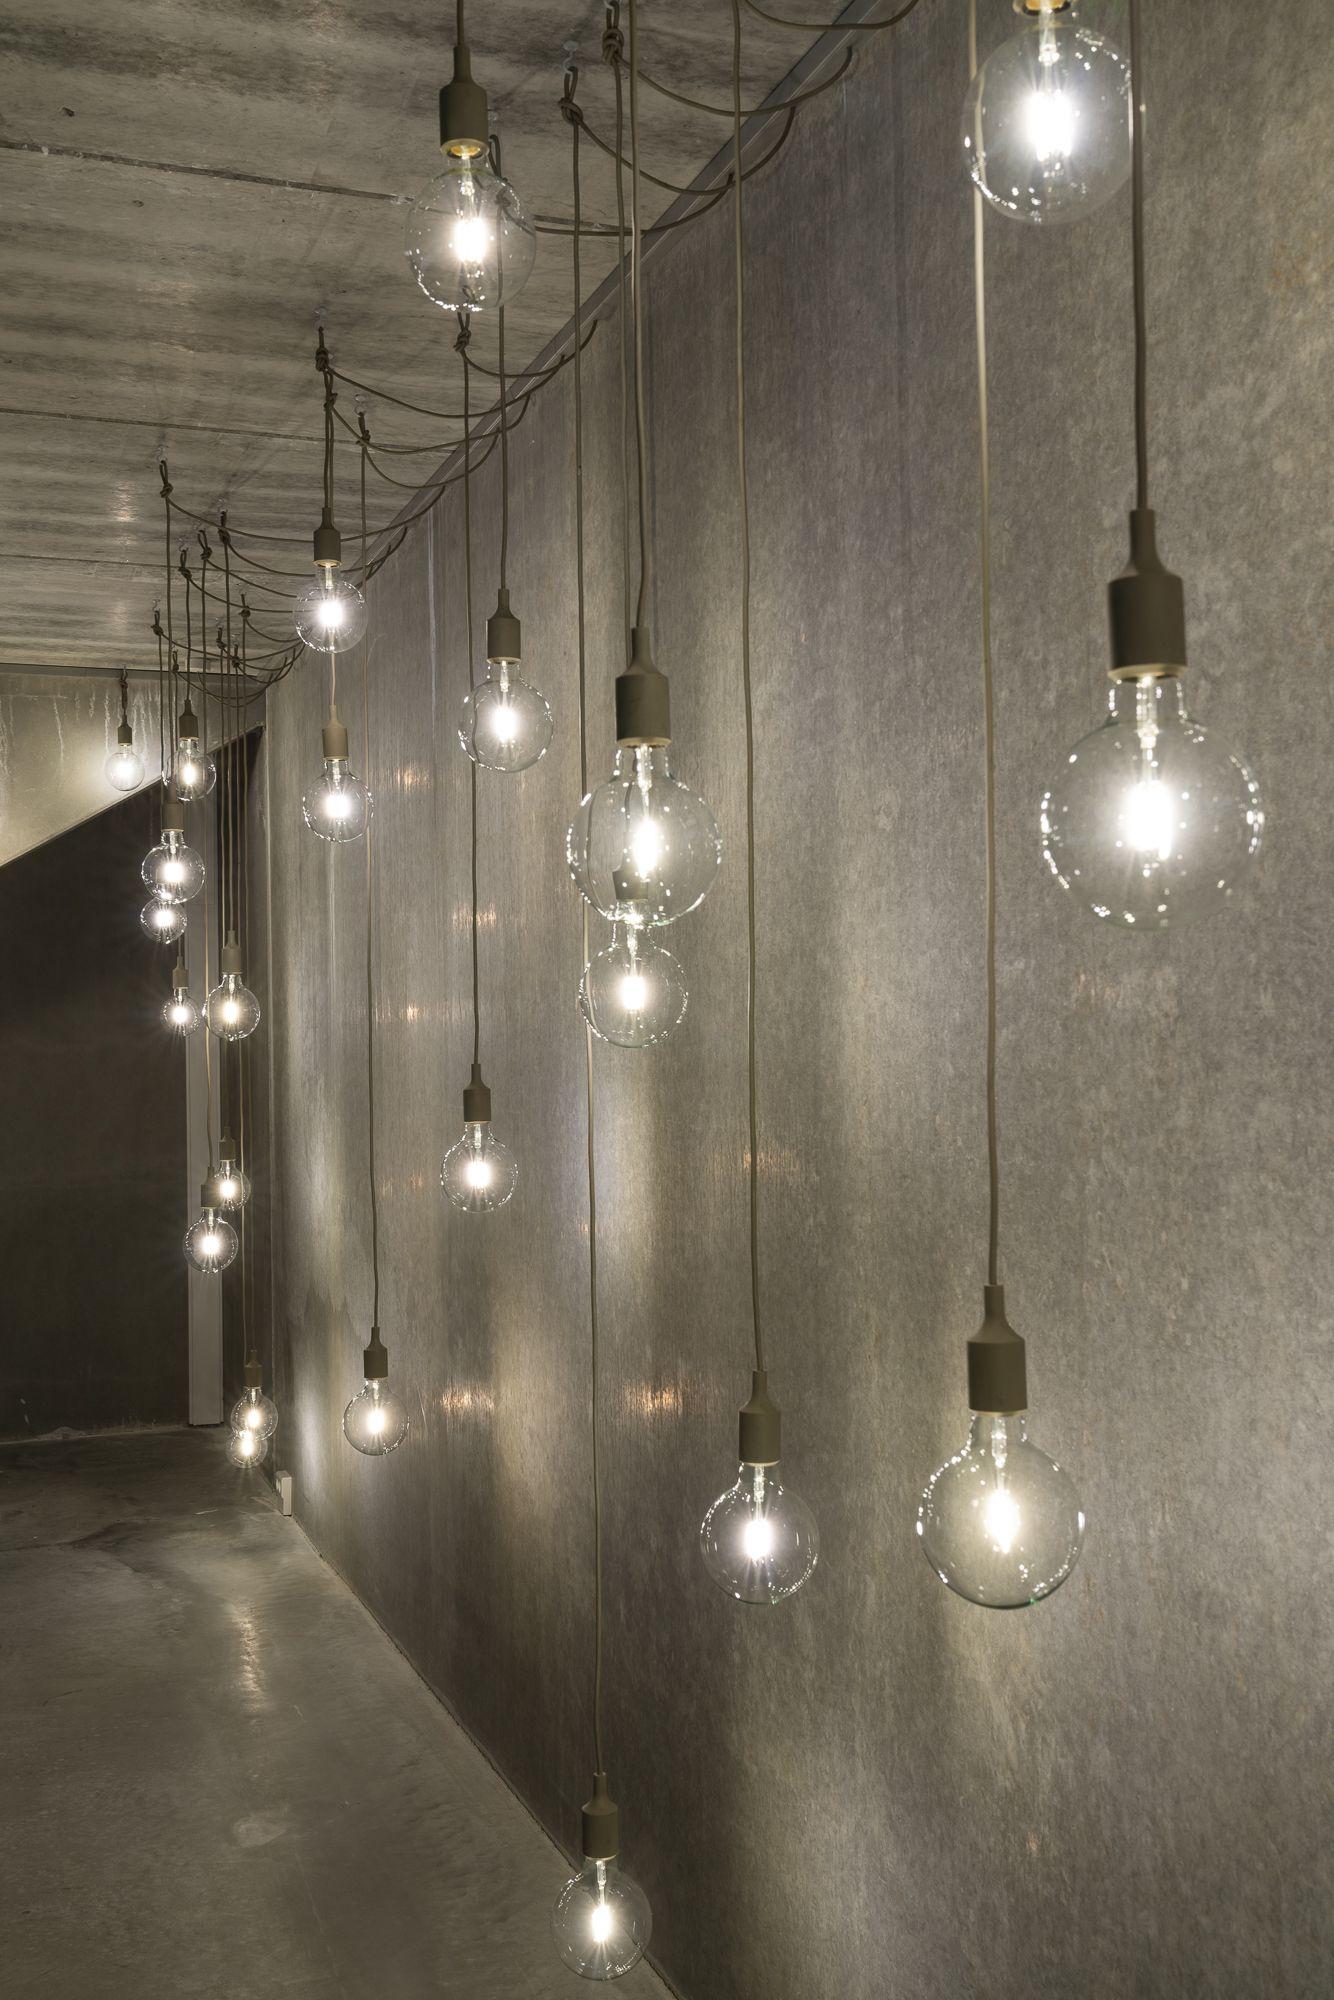 Lighting Decor Inspiration From Muuto At Ambiente Denmark The E27 Pendant Lamp Joins In 2020 Pendant Lamp Scandinavian Furniture Design Scandinavian Interior Design